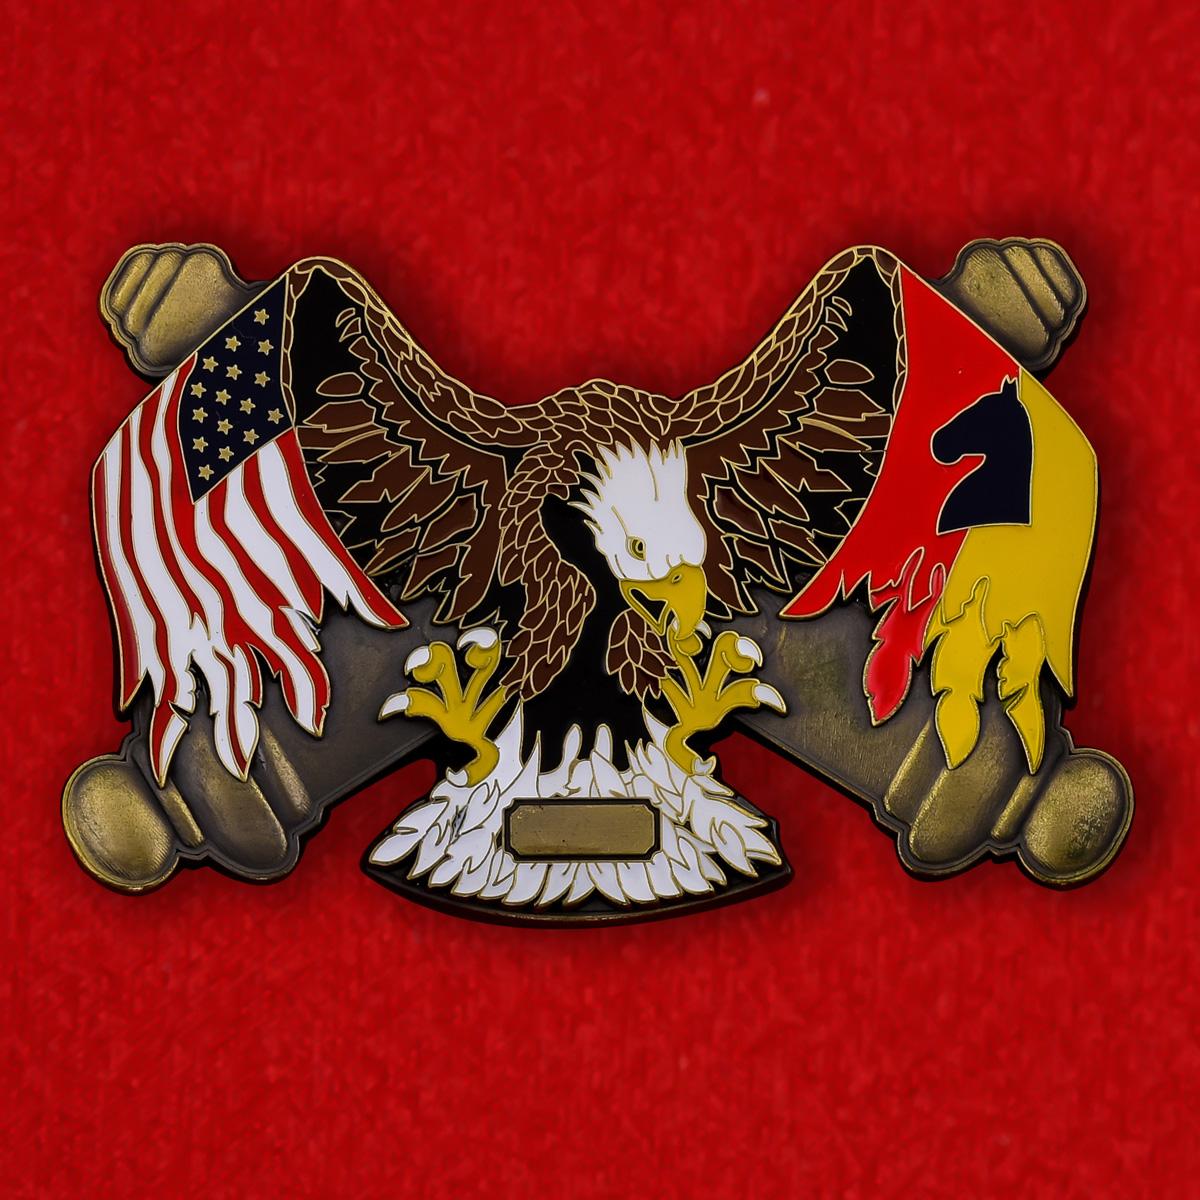 Челлендж коин 2-го батальона 138-й Бригады полевой артиллерии армии США